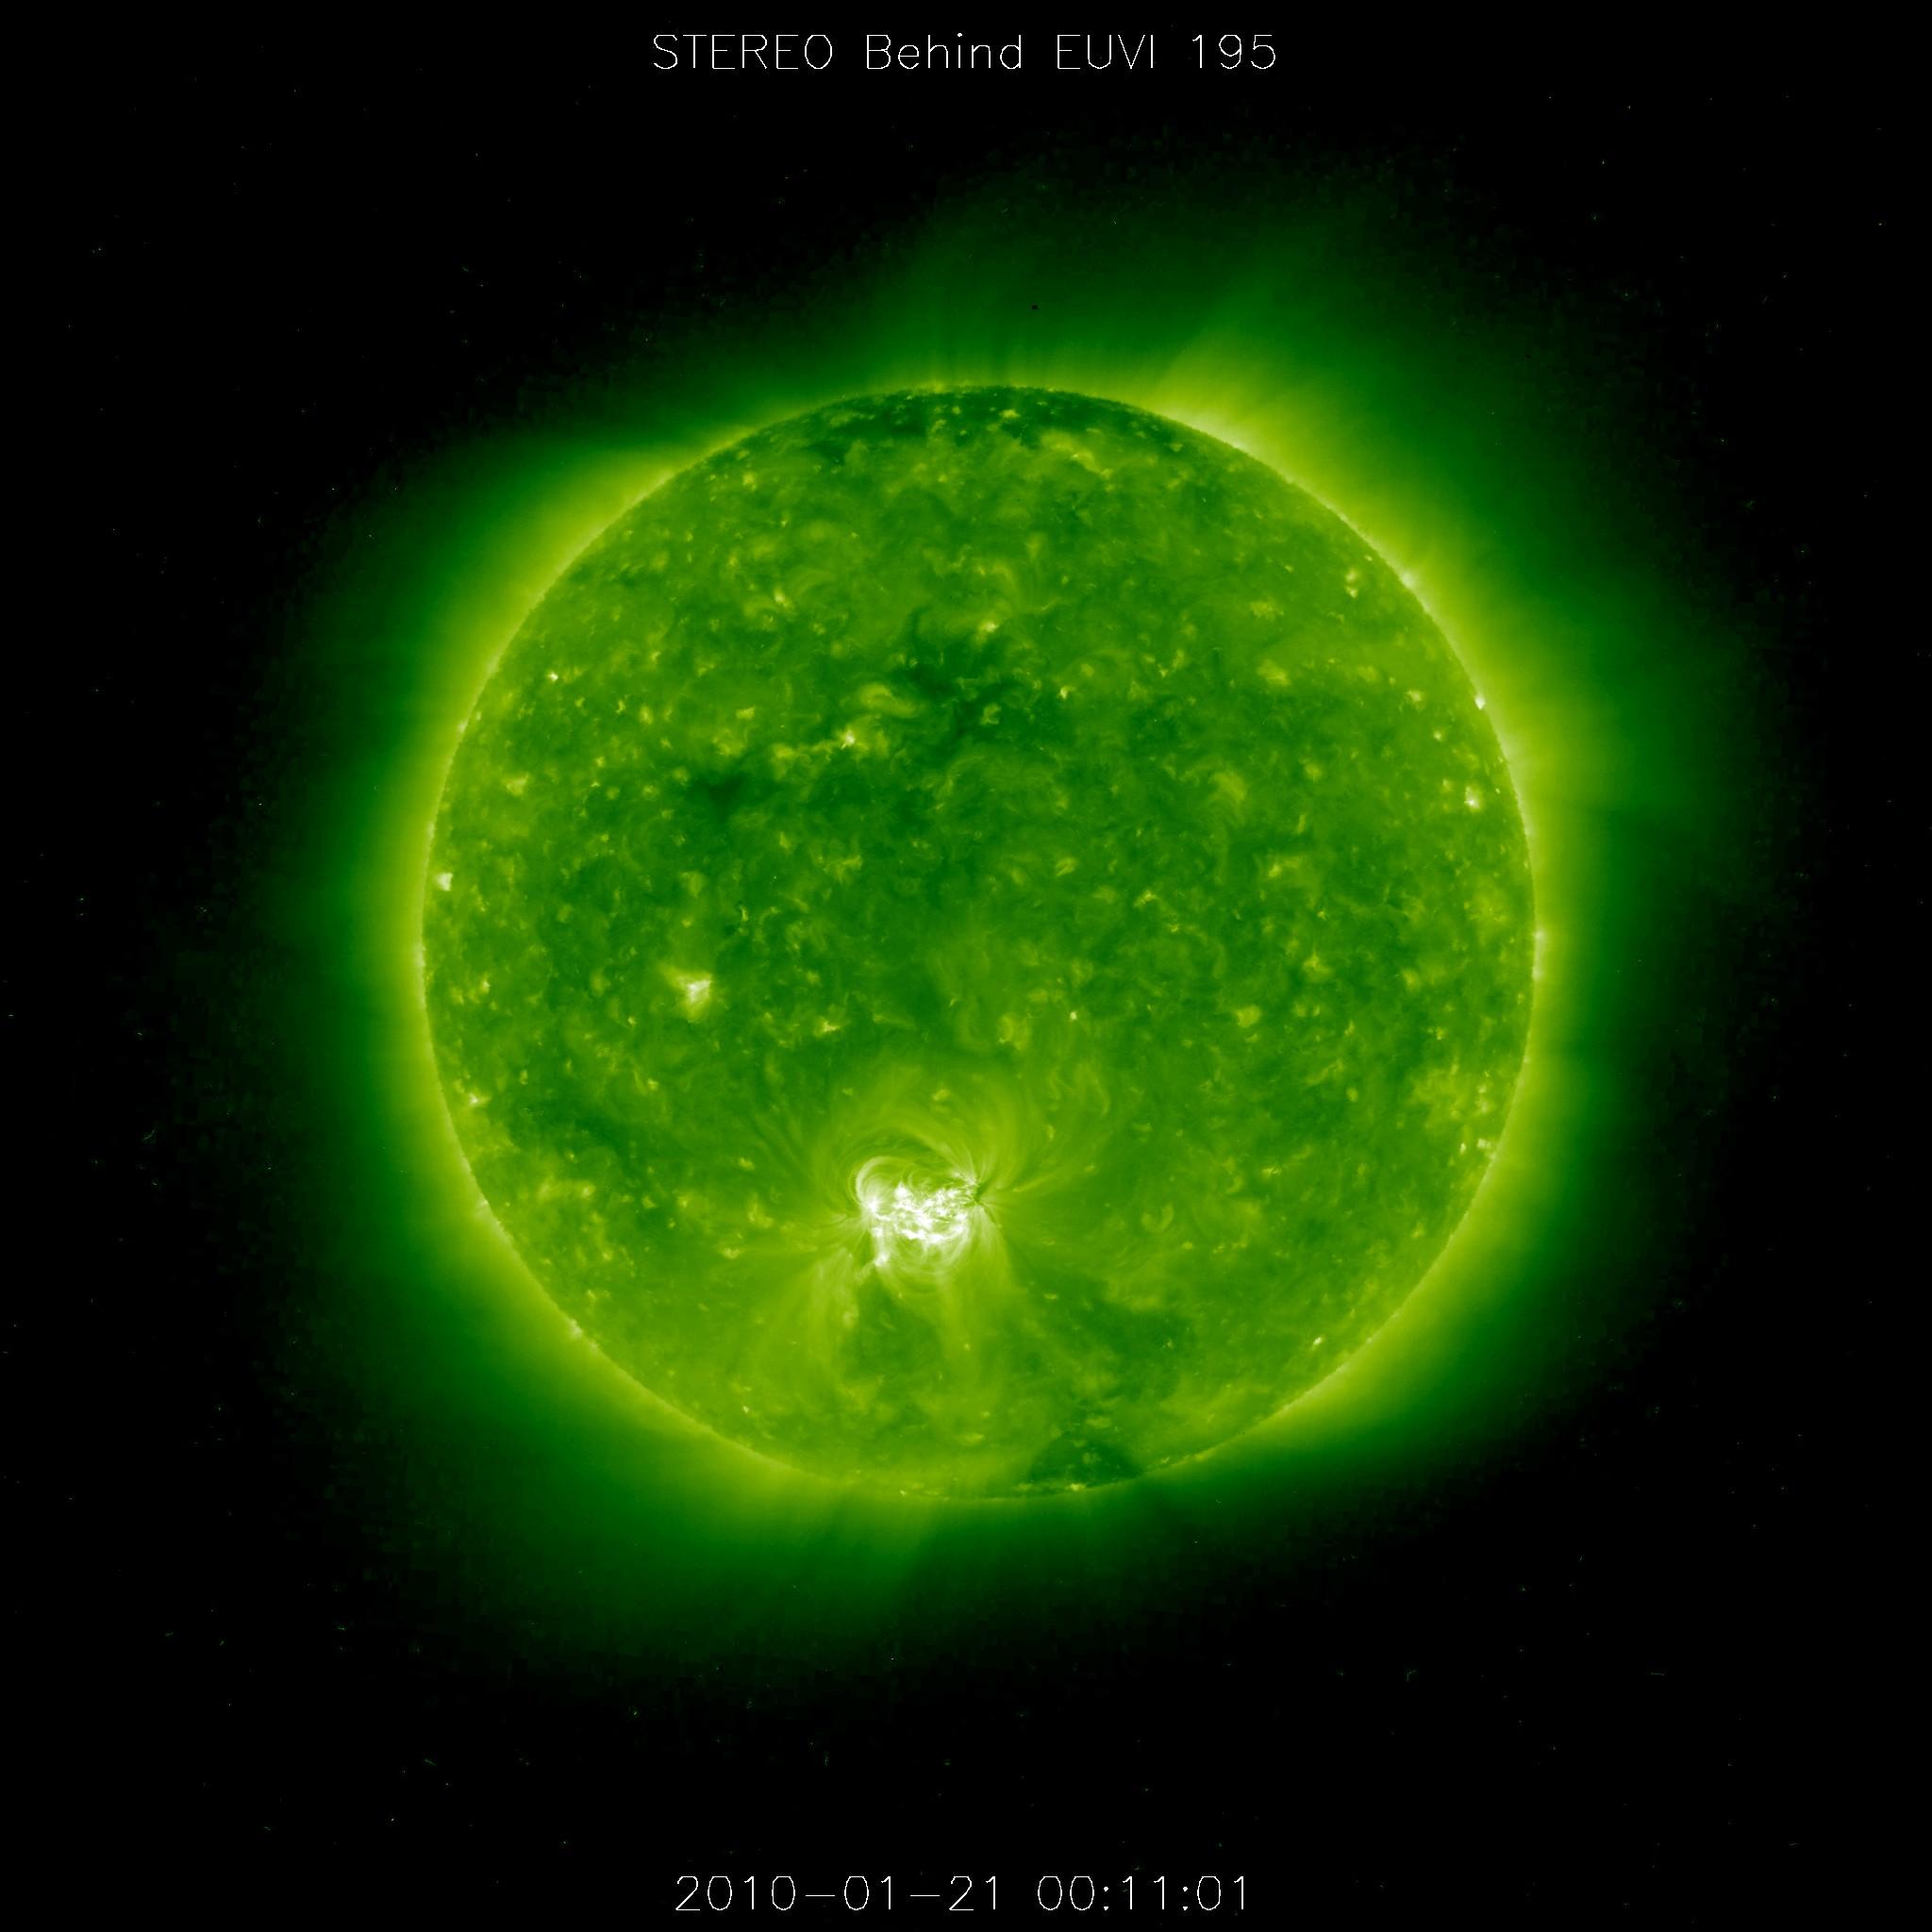 https://i2.wp.com/stereo-ssc.nascom.nasa.gov/browse/2010/01/21/behind/euvi/195/2048/20100121_001030_n4euB_195.jpg